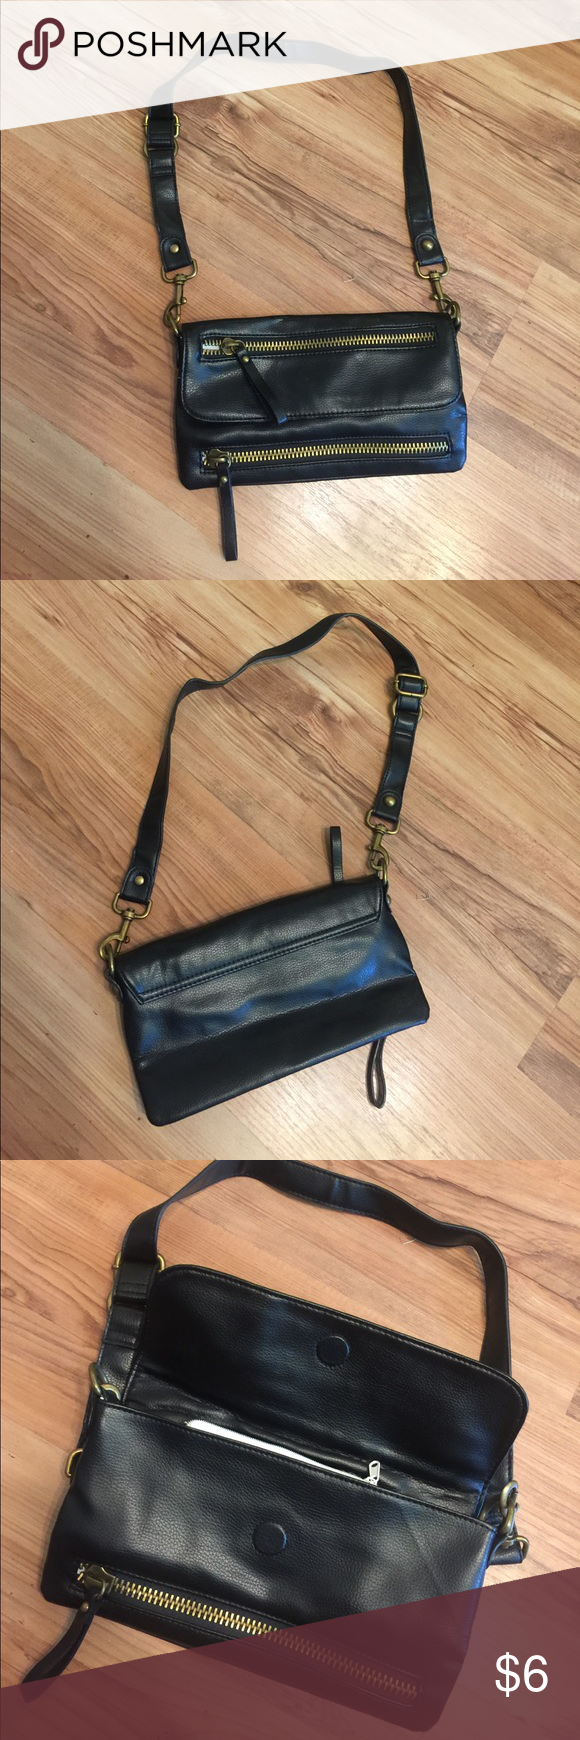 Black double zipper cross body Like new no flaws, strap detachable Bags Crossbody Bags